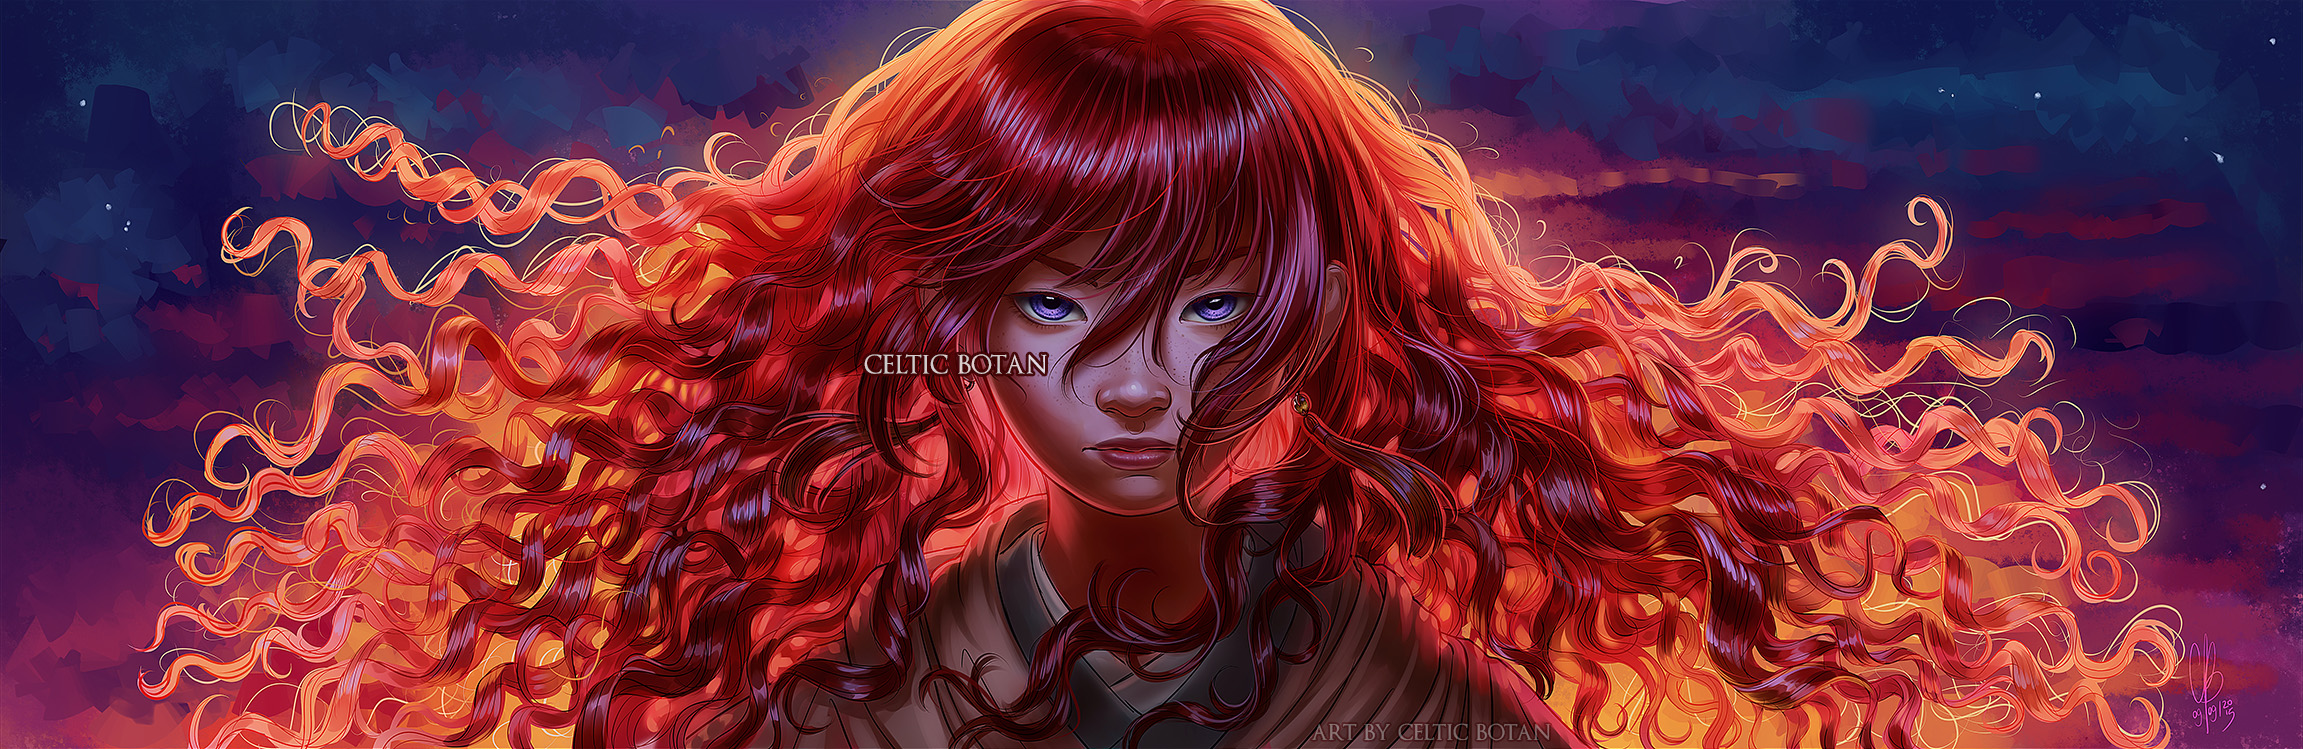 Yona Of The Dawn By Celticbotan On Deviantart